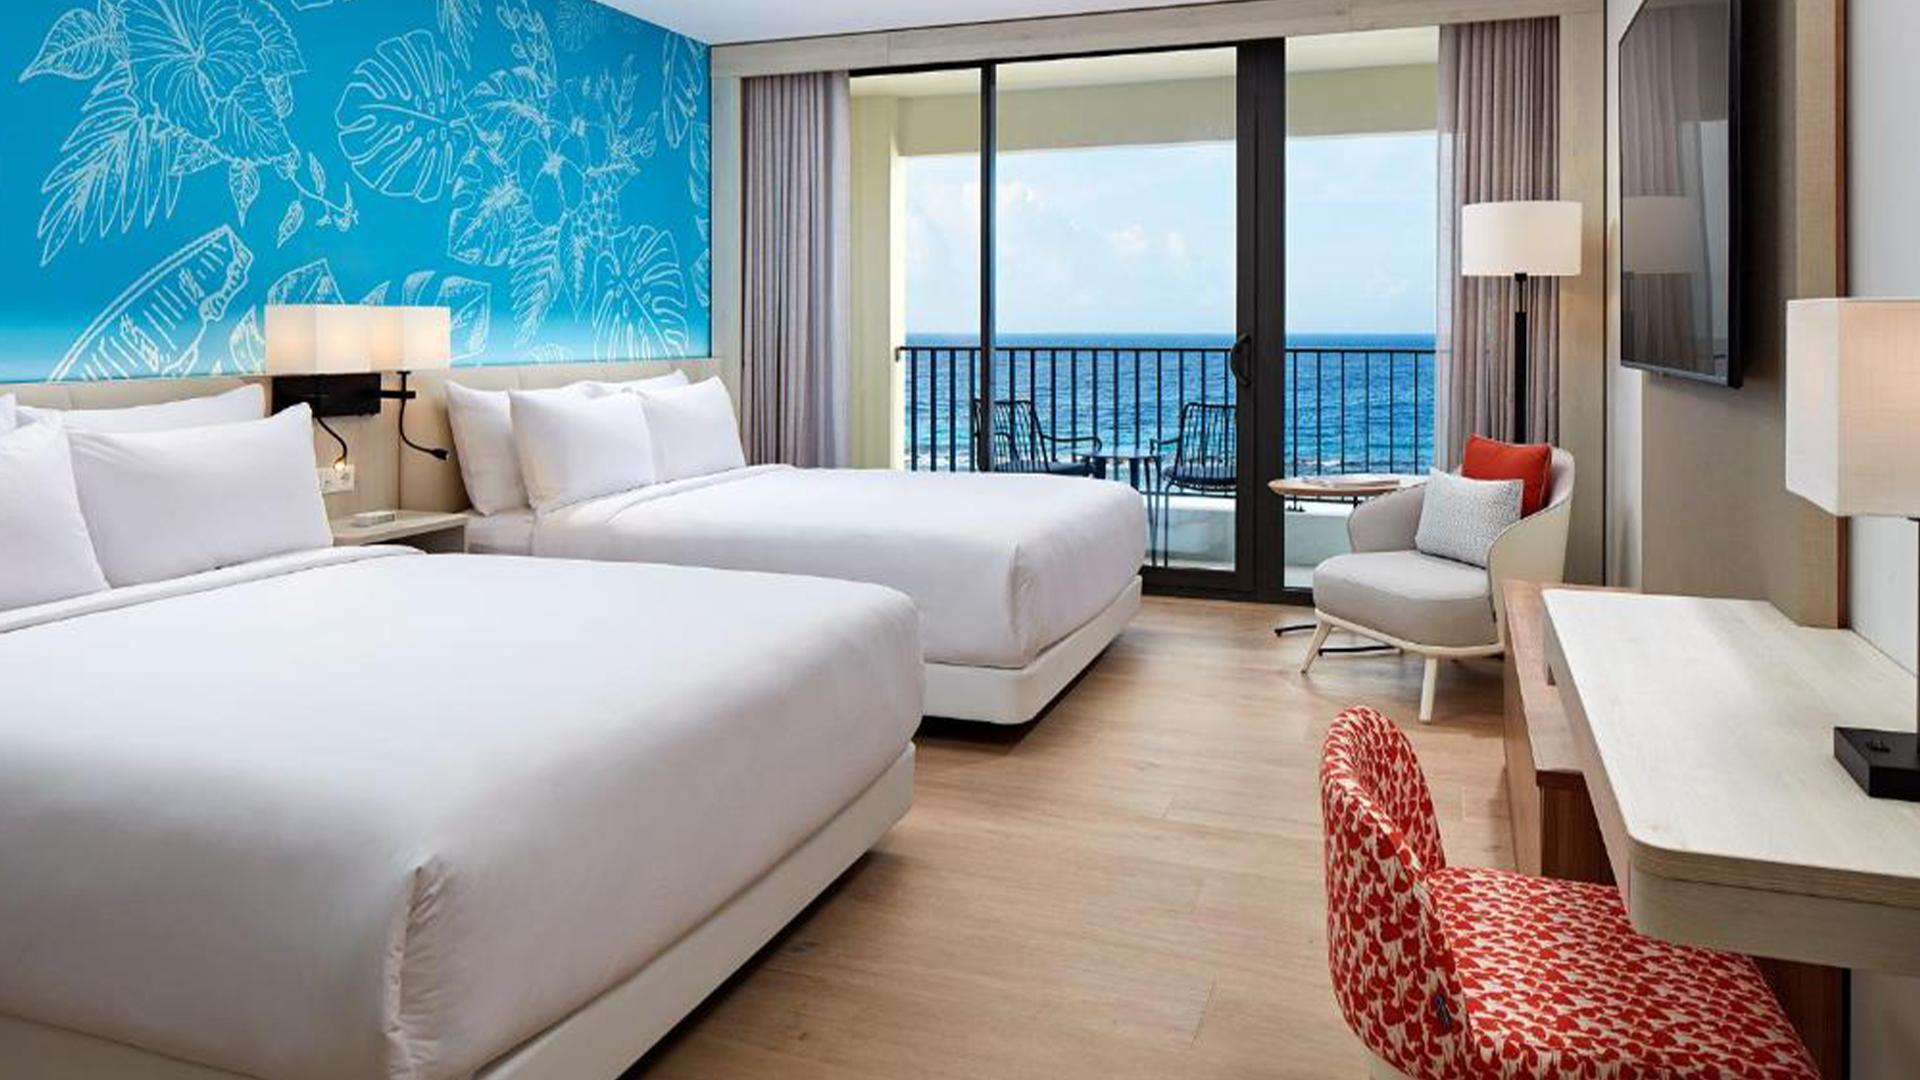 Ocean Front Queen Room image 1 at Curaçao Marriott Beach Resort by null, Curaçao, Curaçao